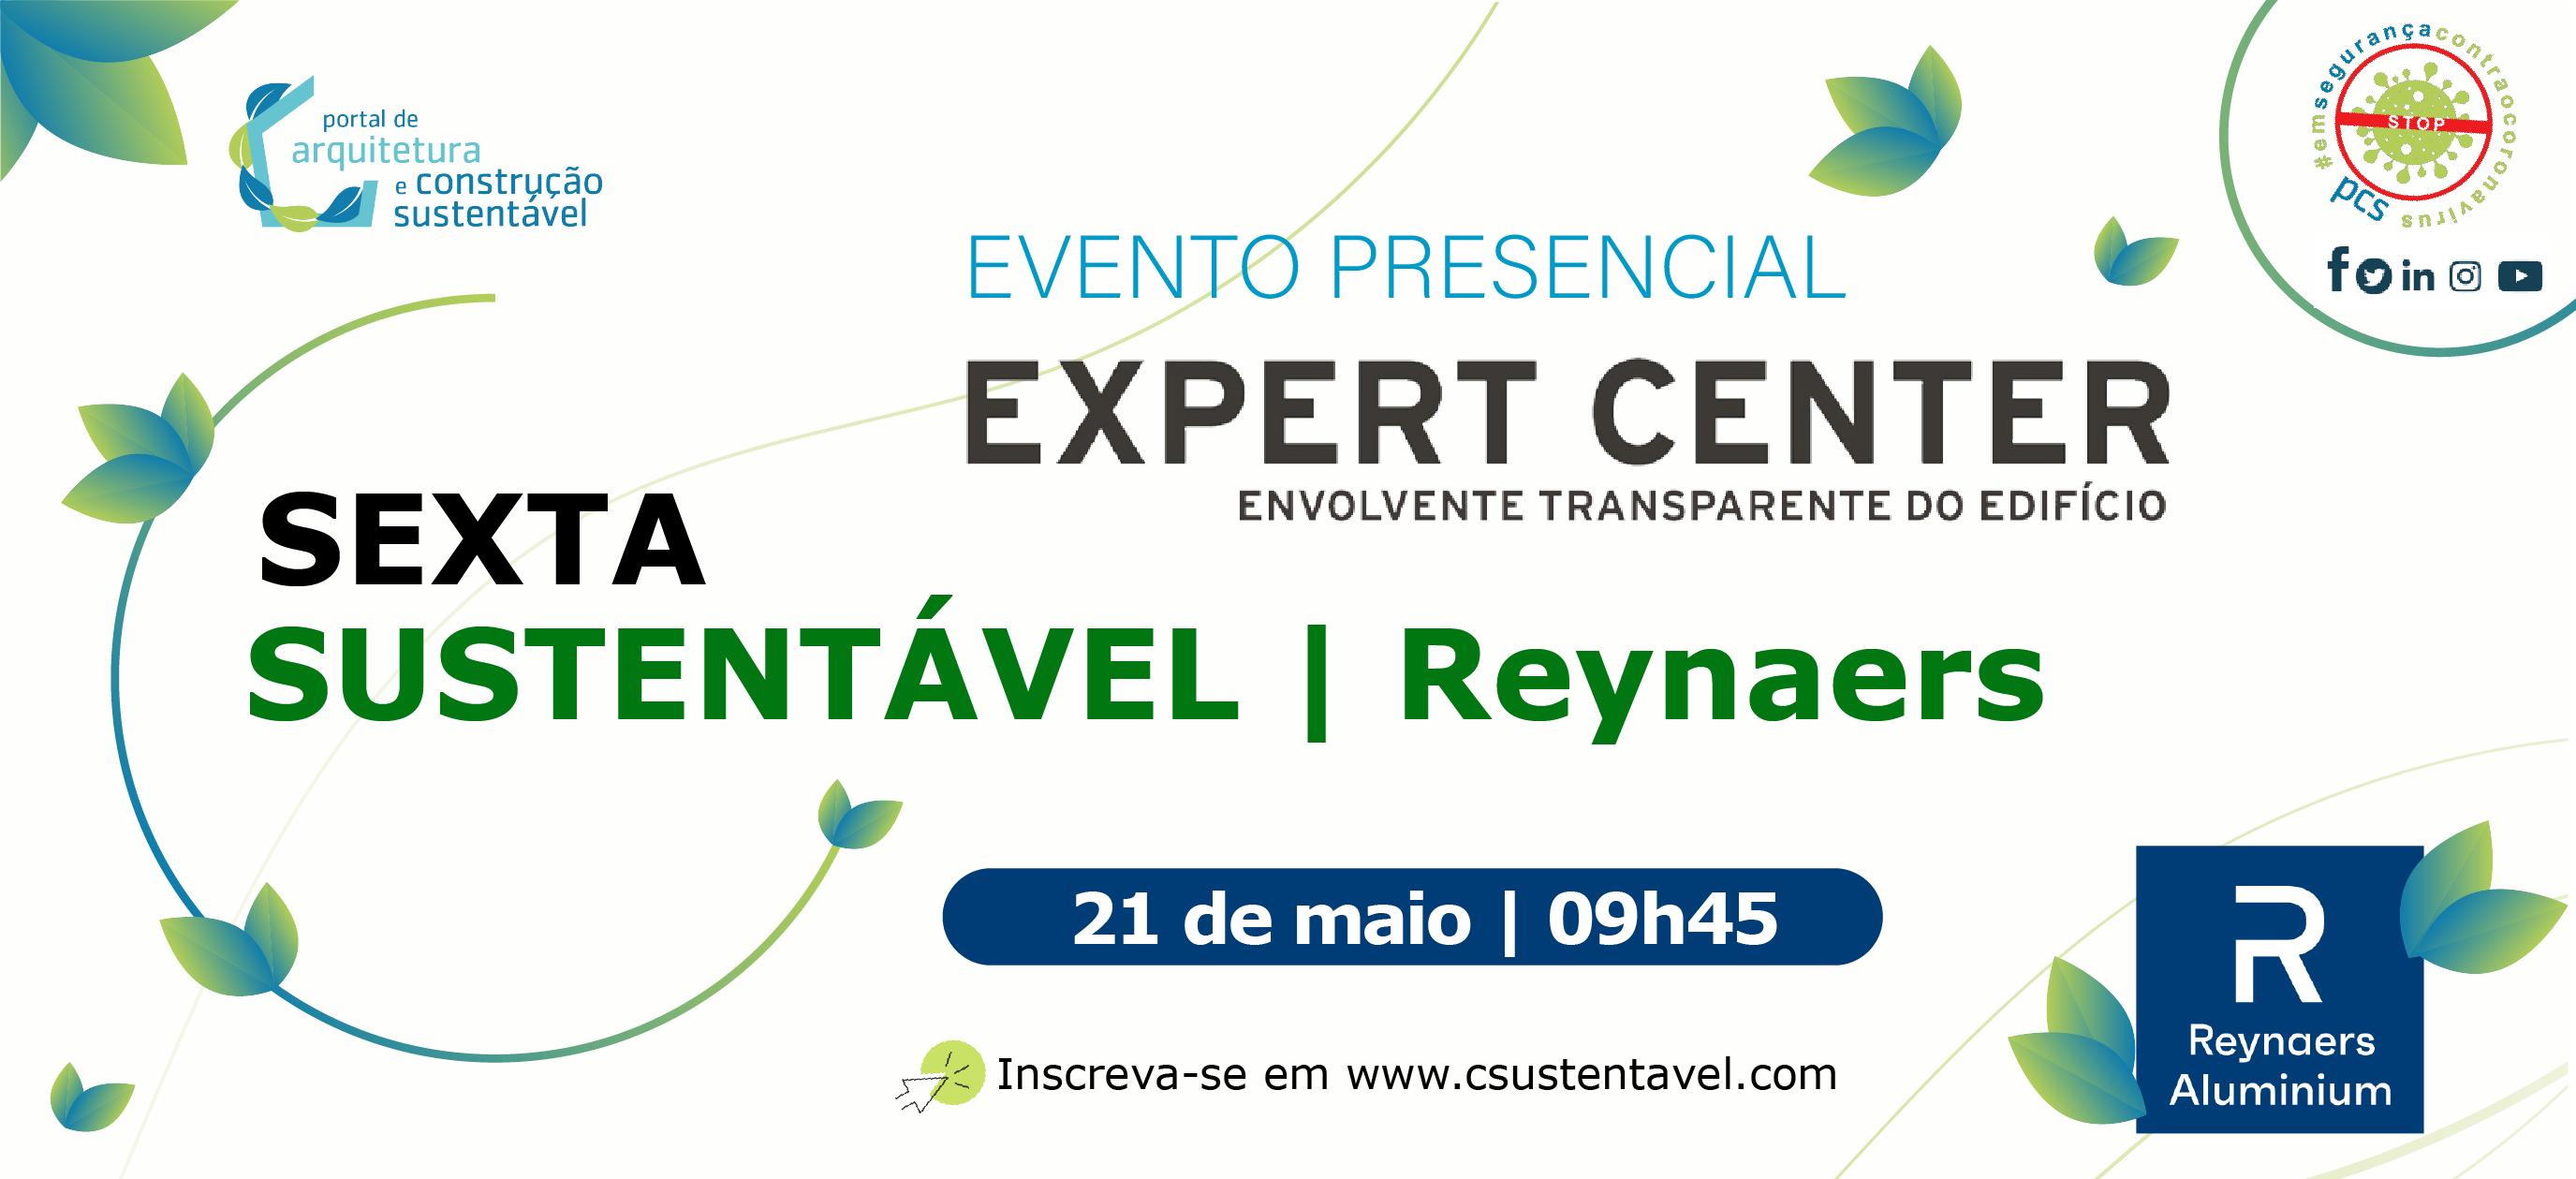 sexta-sustentavel_reynaerspresencial_logos-01